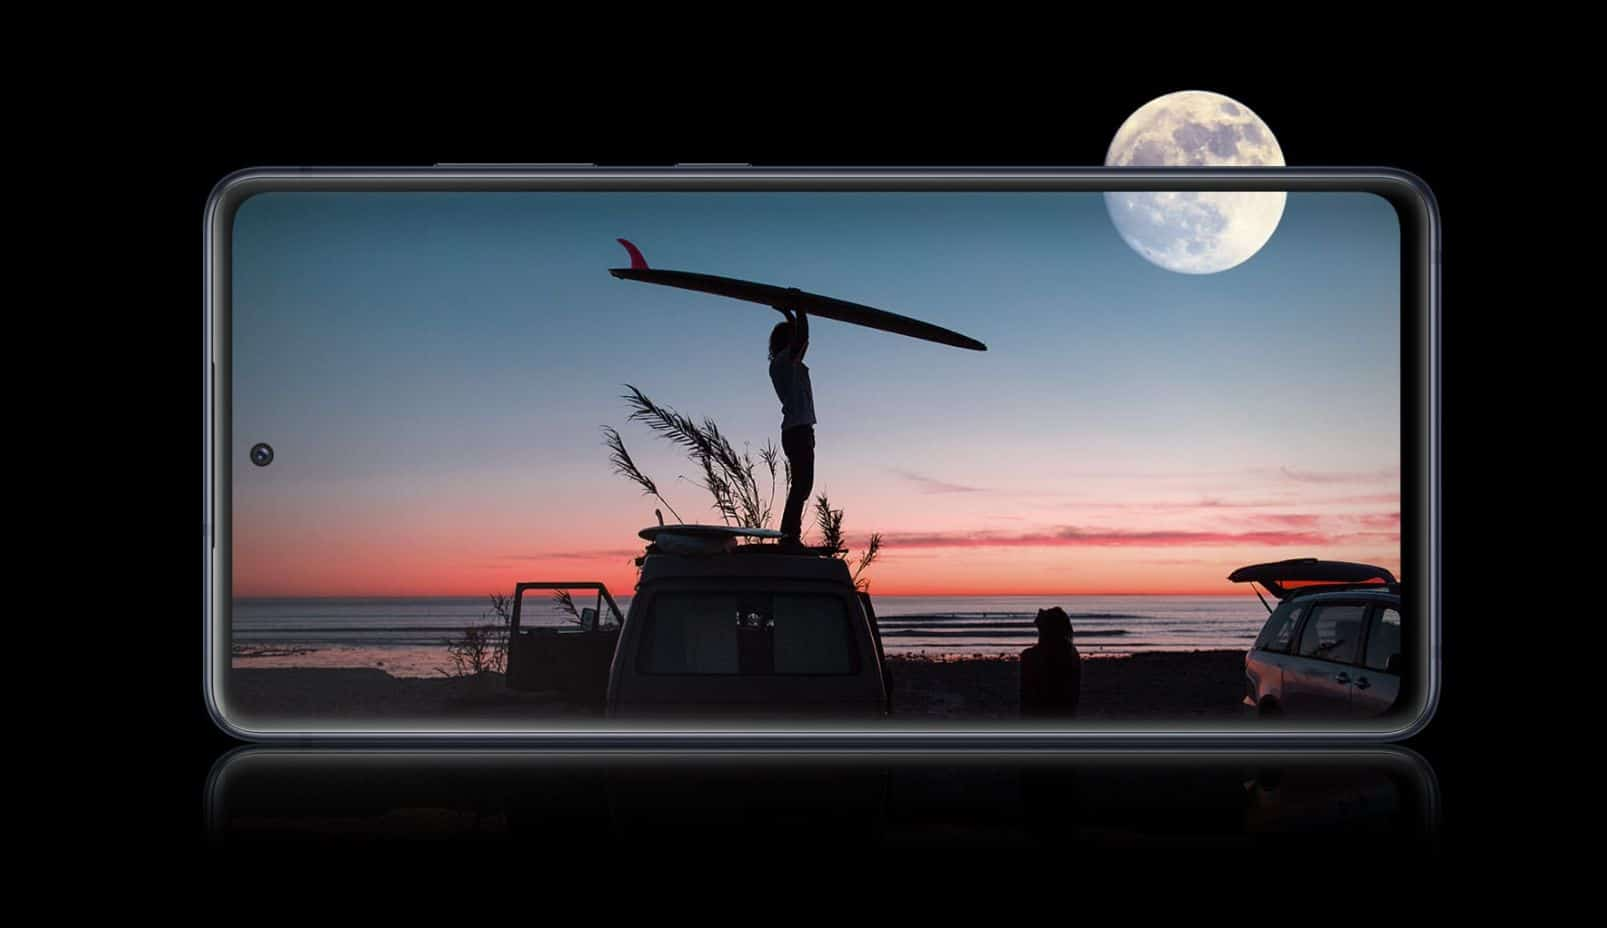 Harga dan Spesifikasi Samsung Galaxy S20 FE